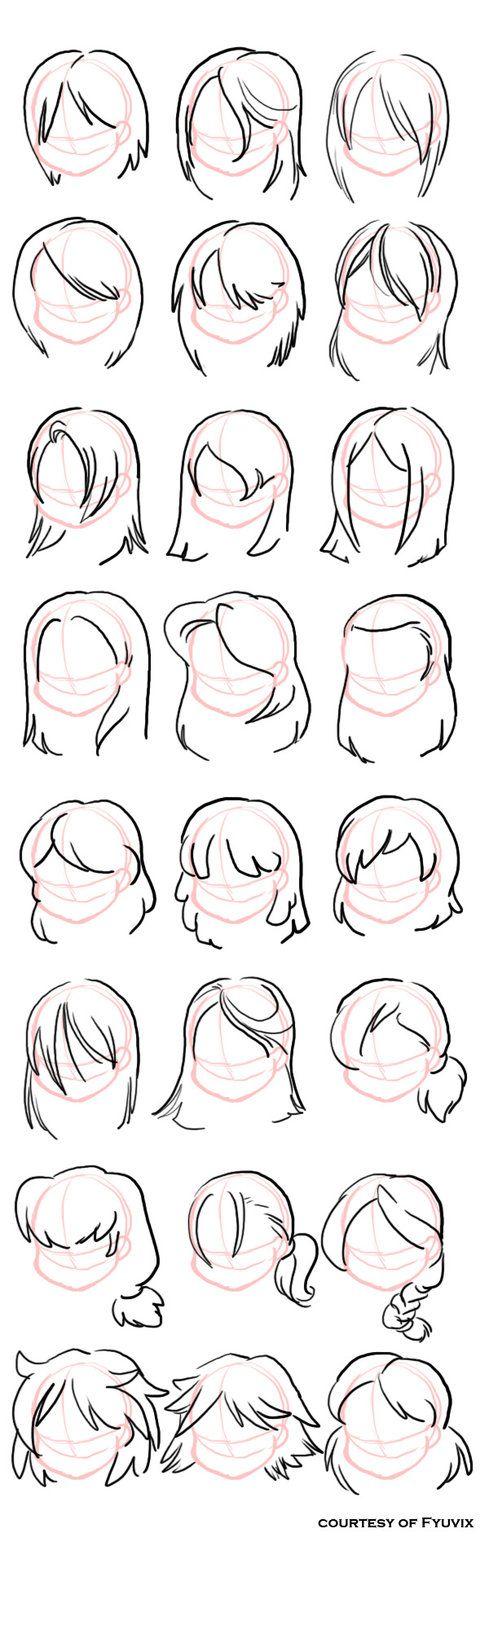 Dibujar pelo largo                                                                                                                                                      Más